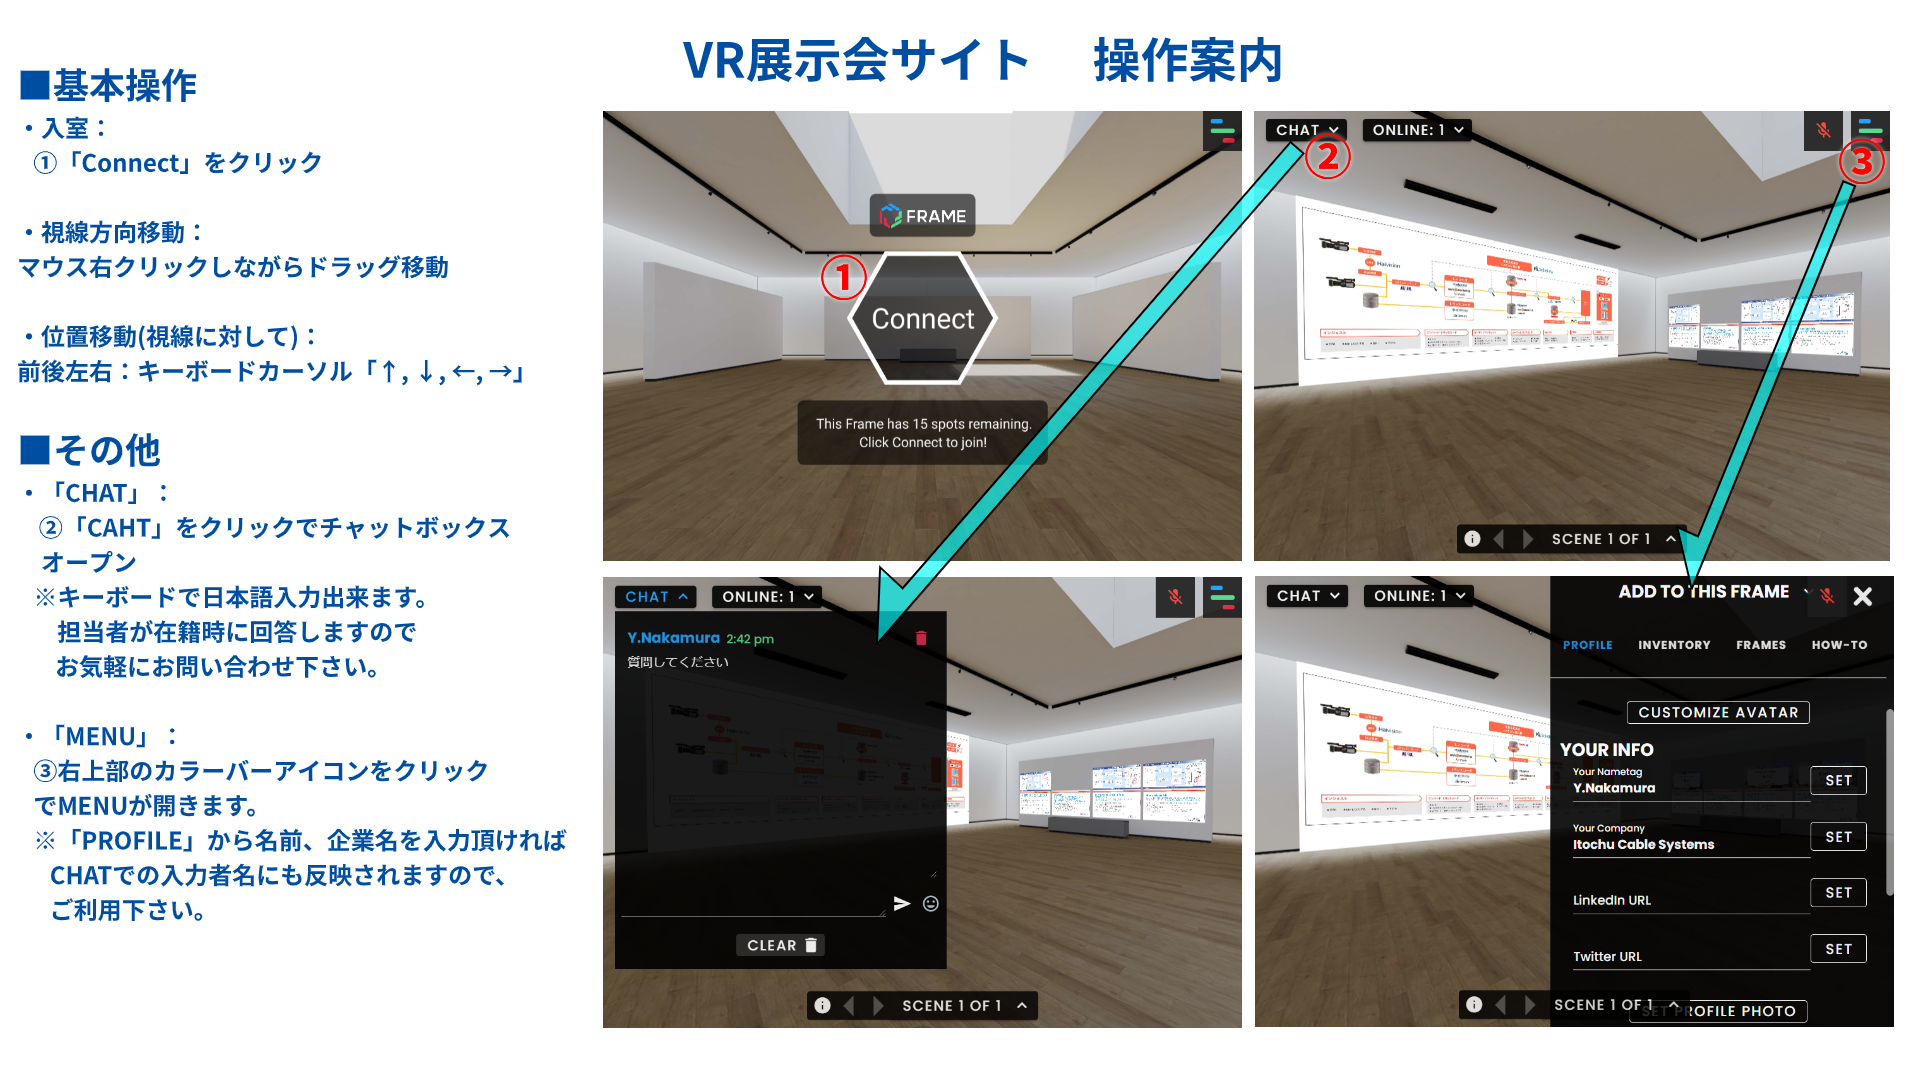 VR展示会サイト 操作案内